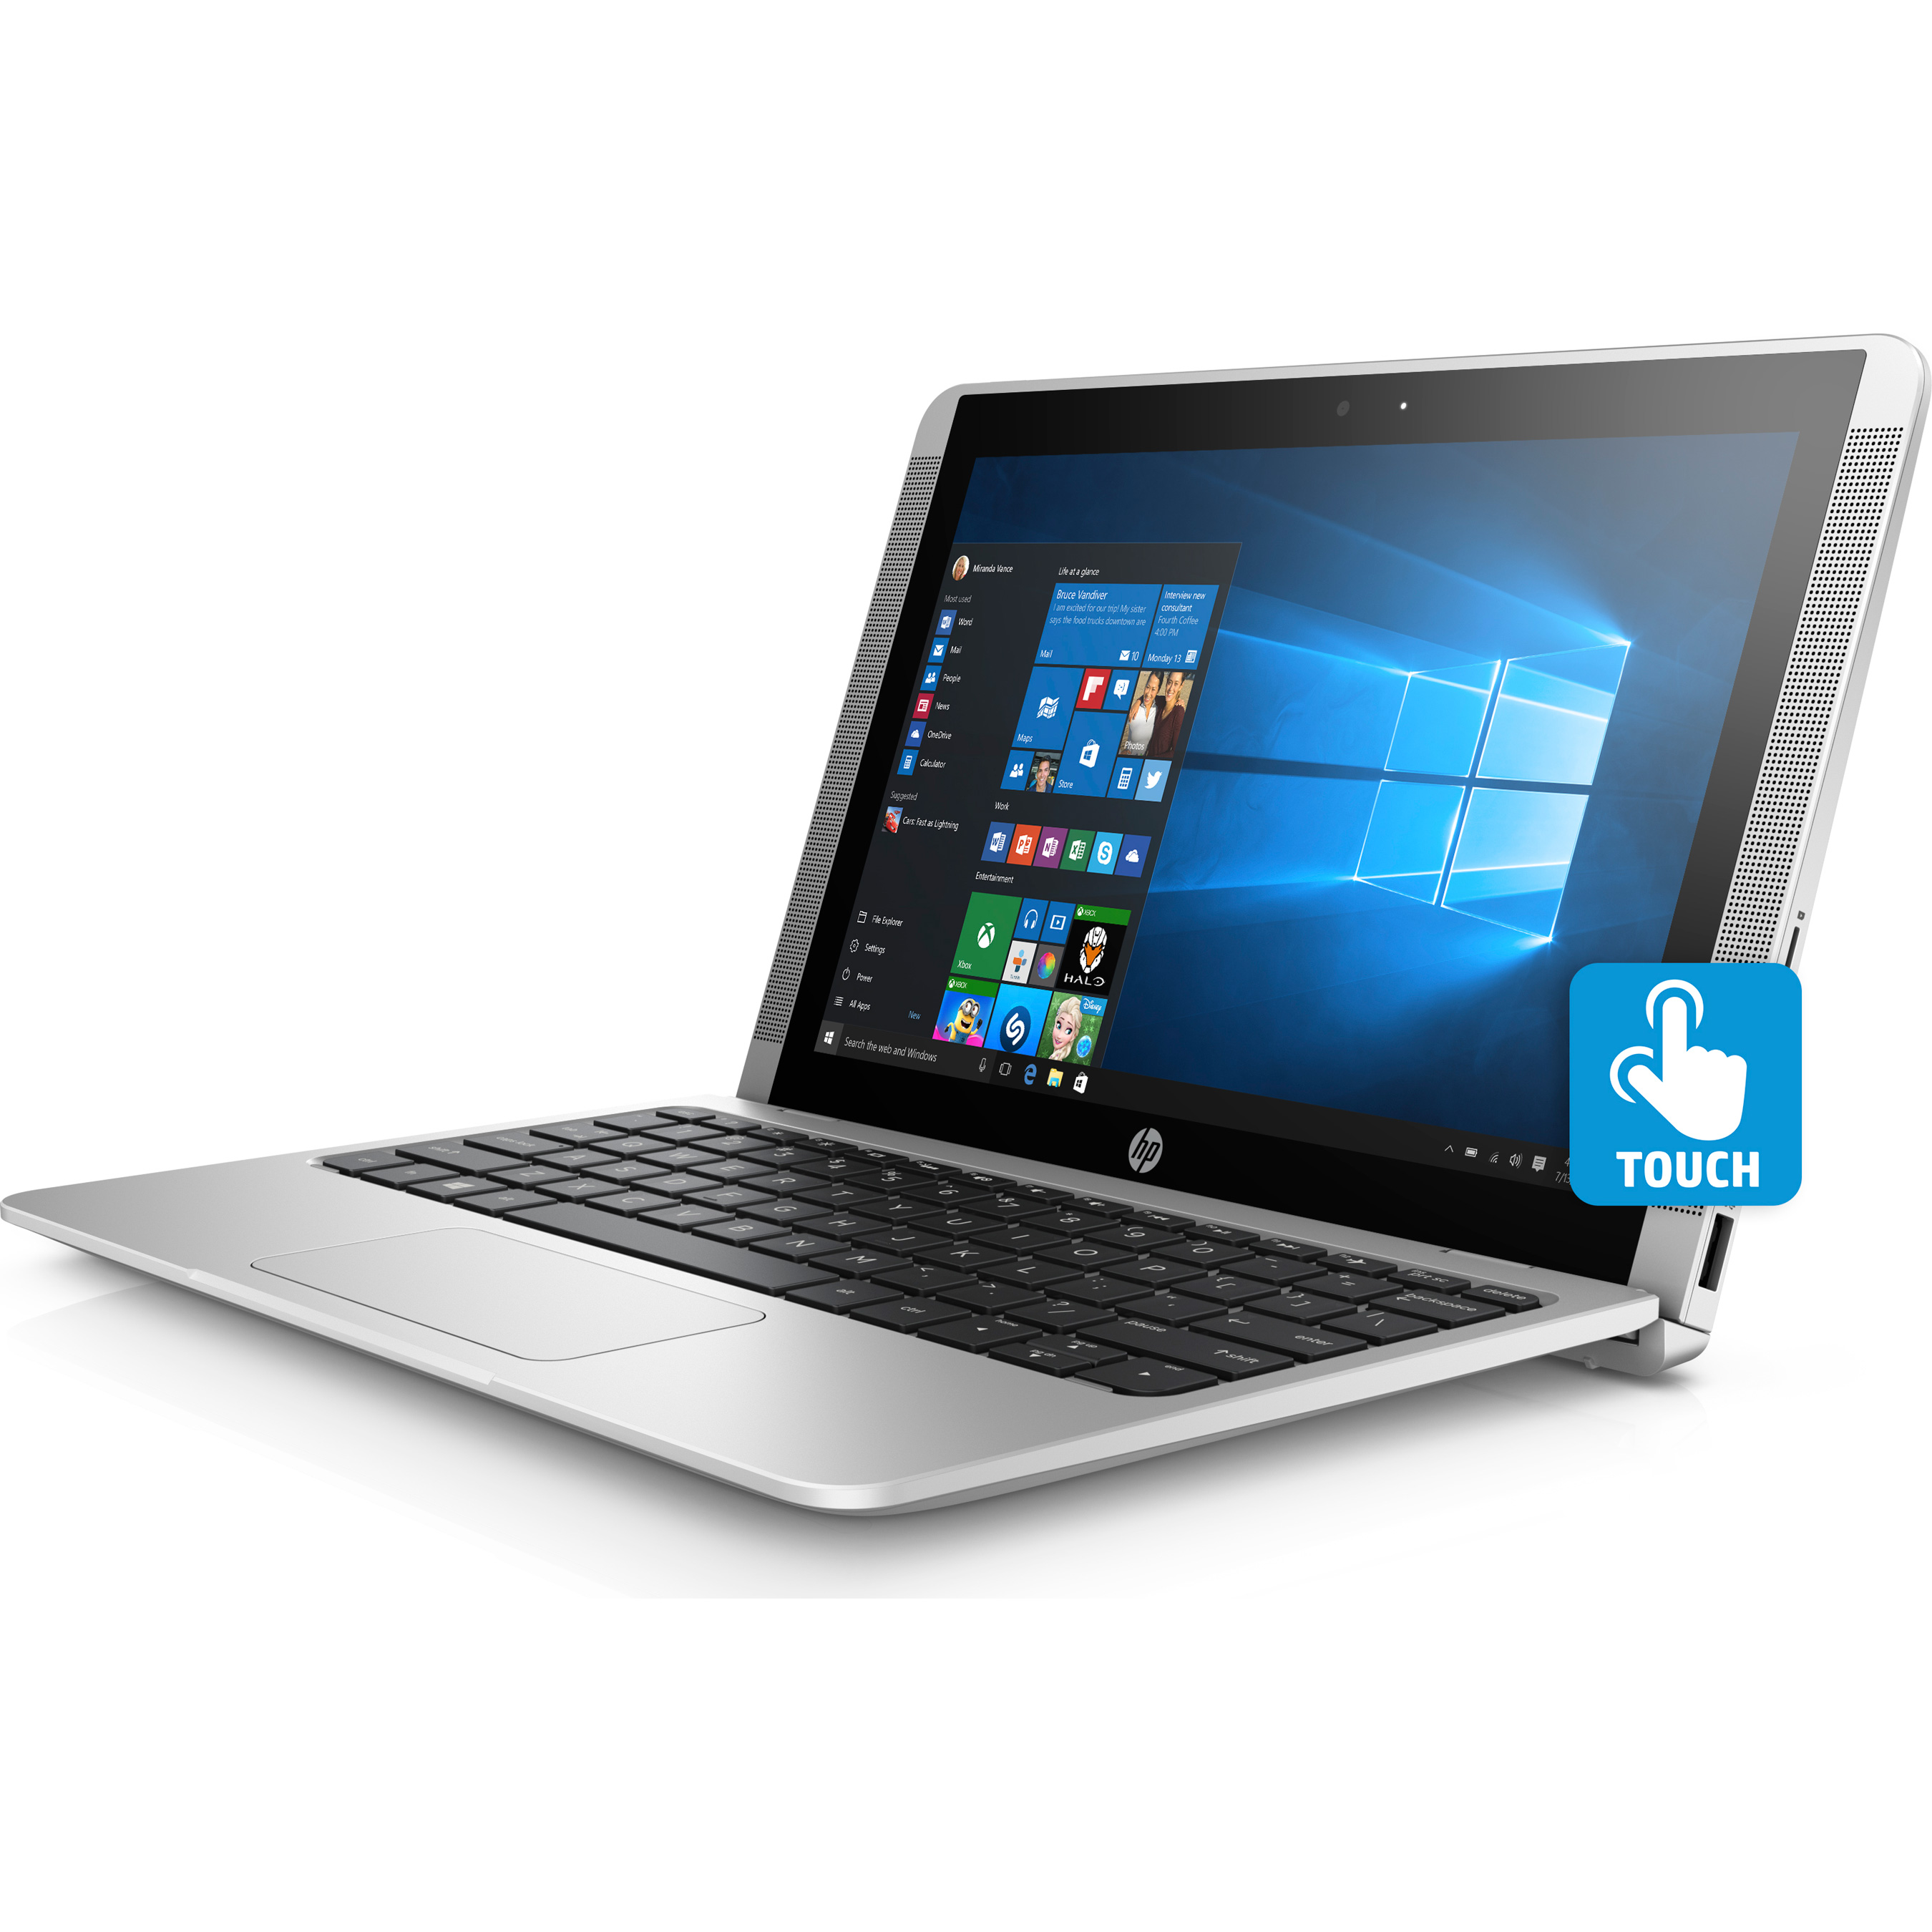 Hewlett Packard X2 Detachable 10 P020nr 10 1 Quot Multitouch